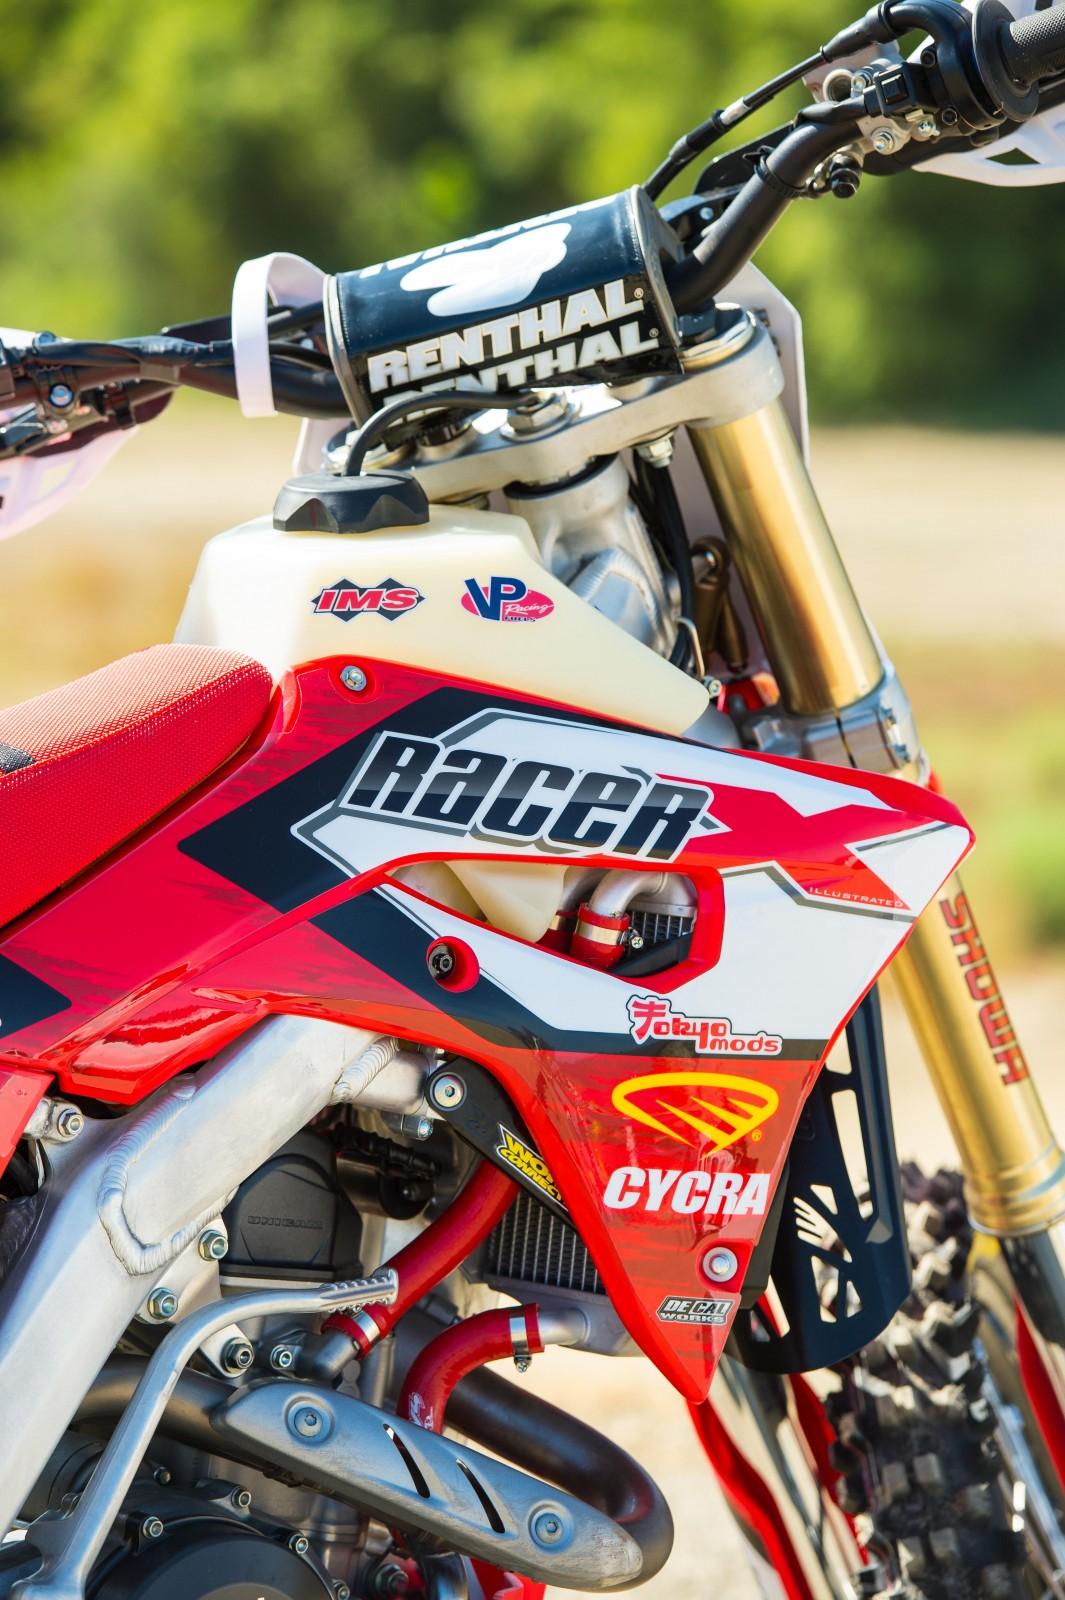 Racer X Films 2018 Honda Crf450rx Racer X Online